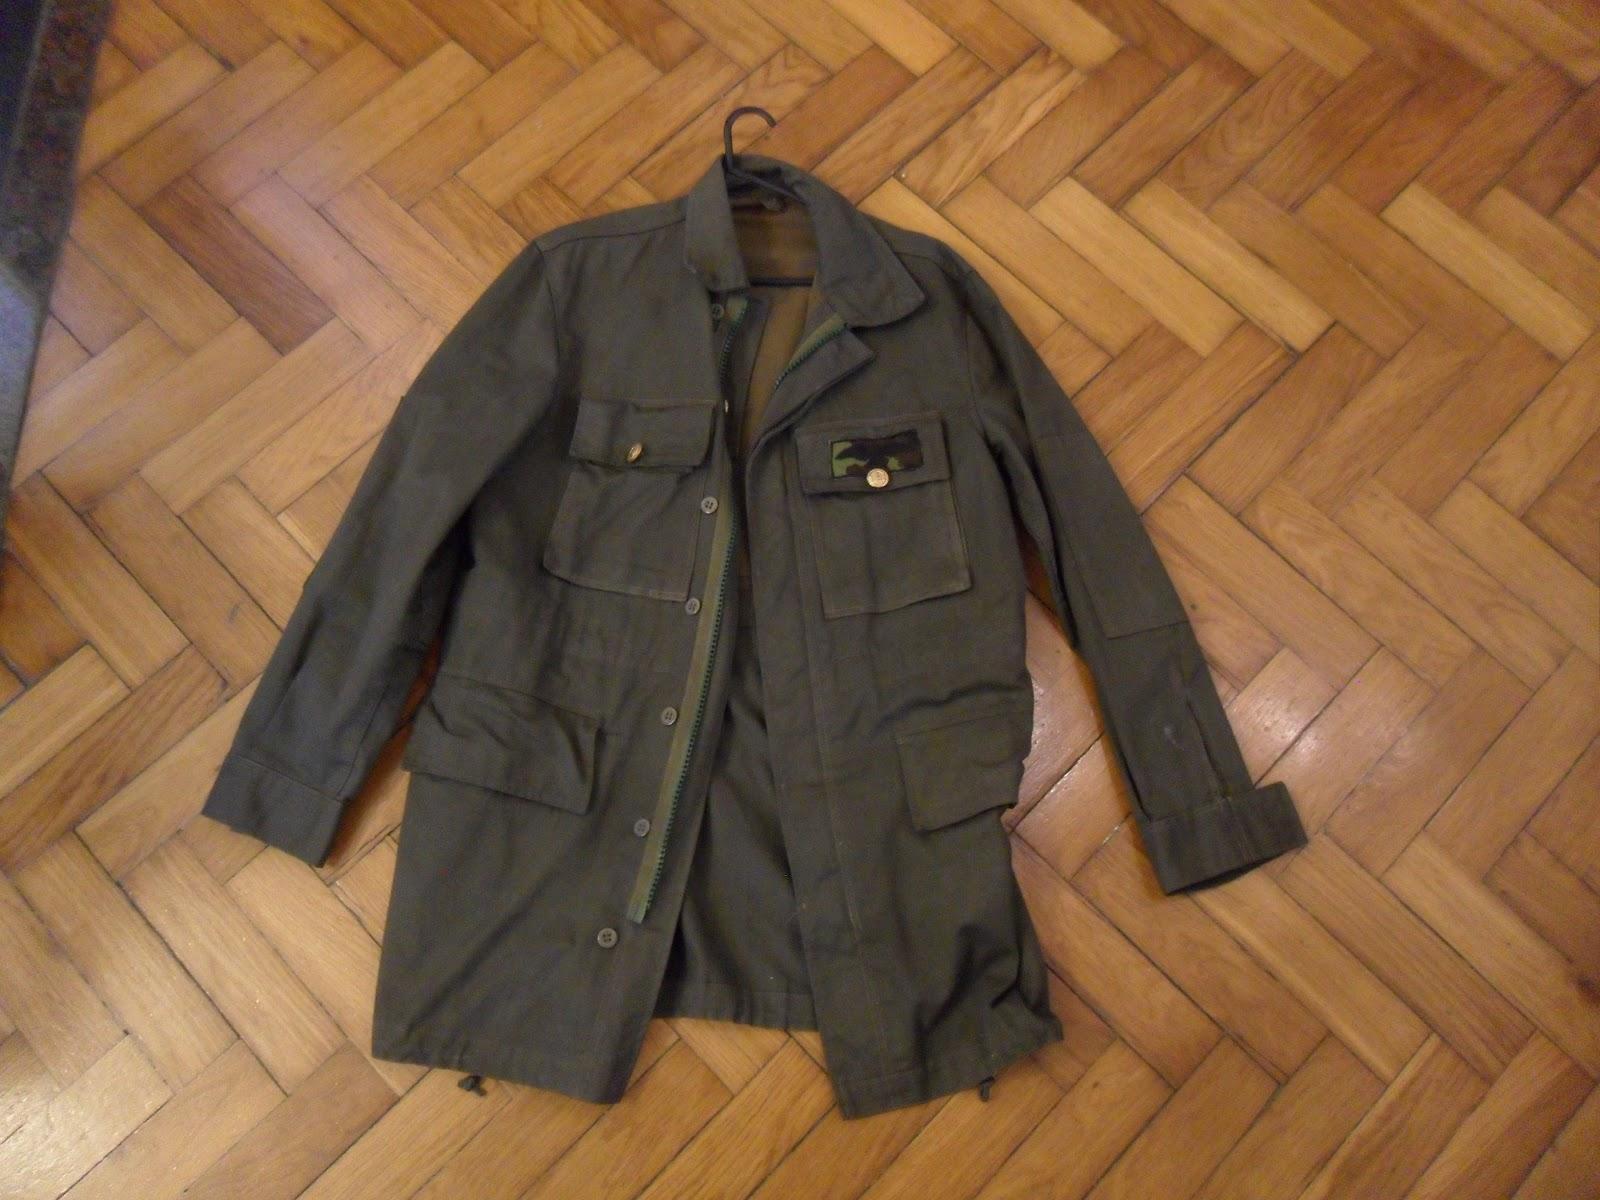 chaqueta del ejercito argentino 3adfc6ad8d9